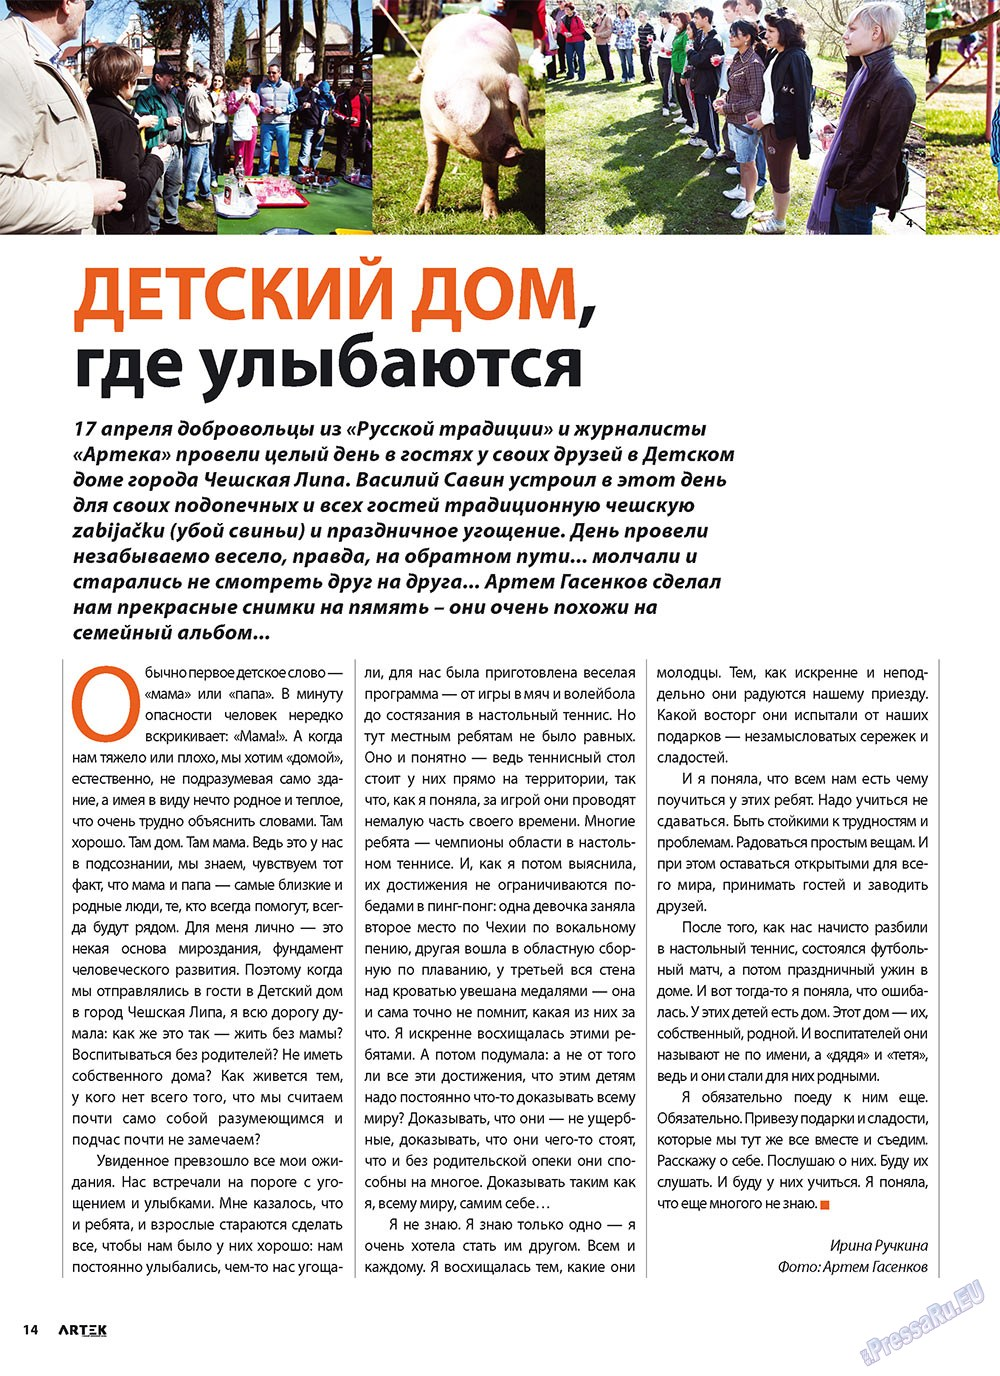 Артек (журнал). 2010 год, номер 3, стр. 16